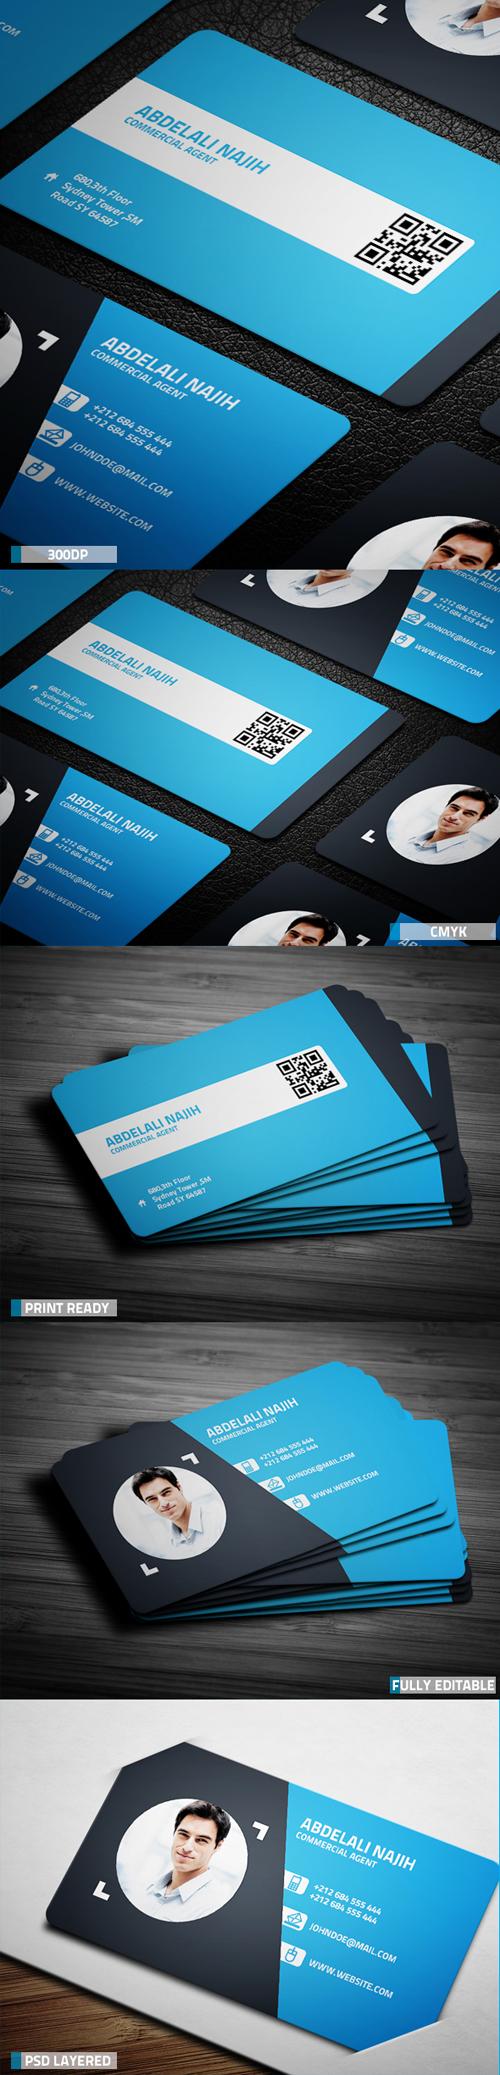 business cards template design - 9